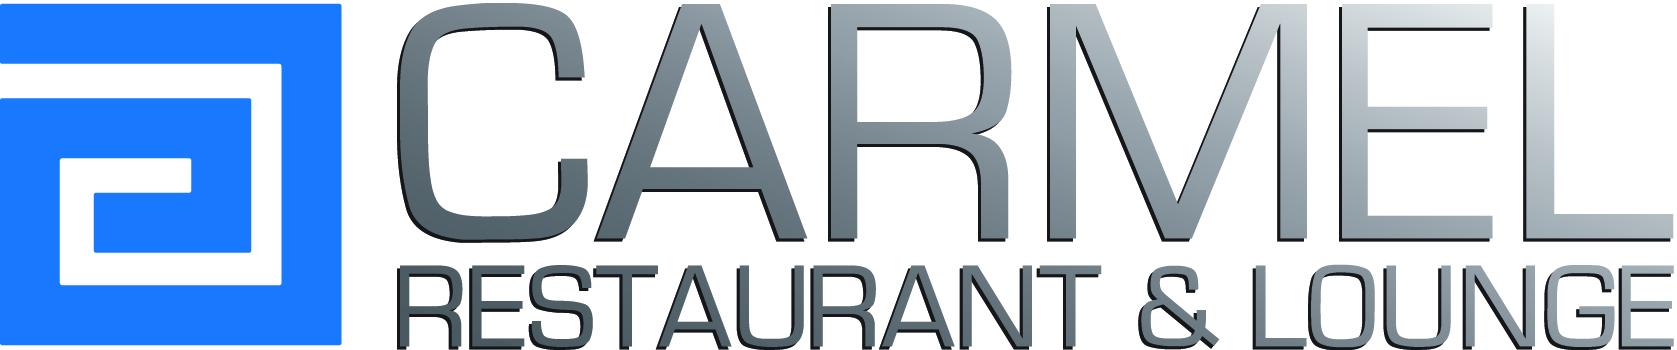 CarmelRestaurant&Lounge_Logo_CLR_Dec2014